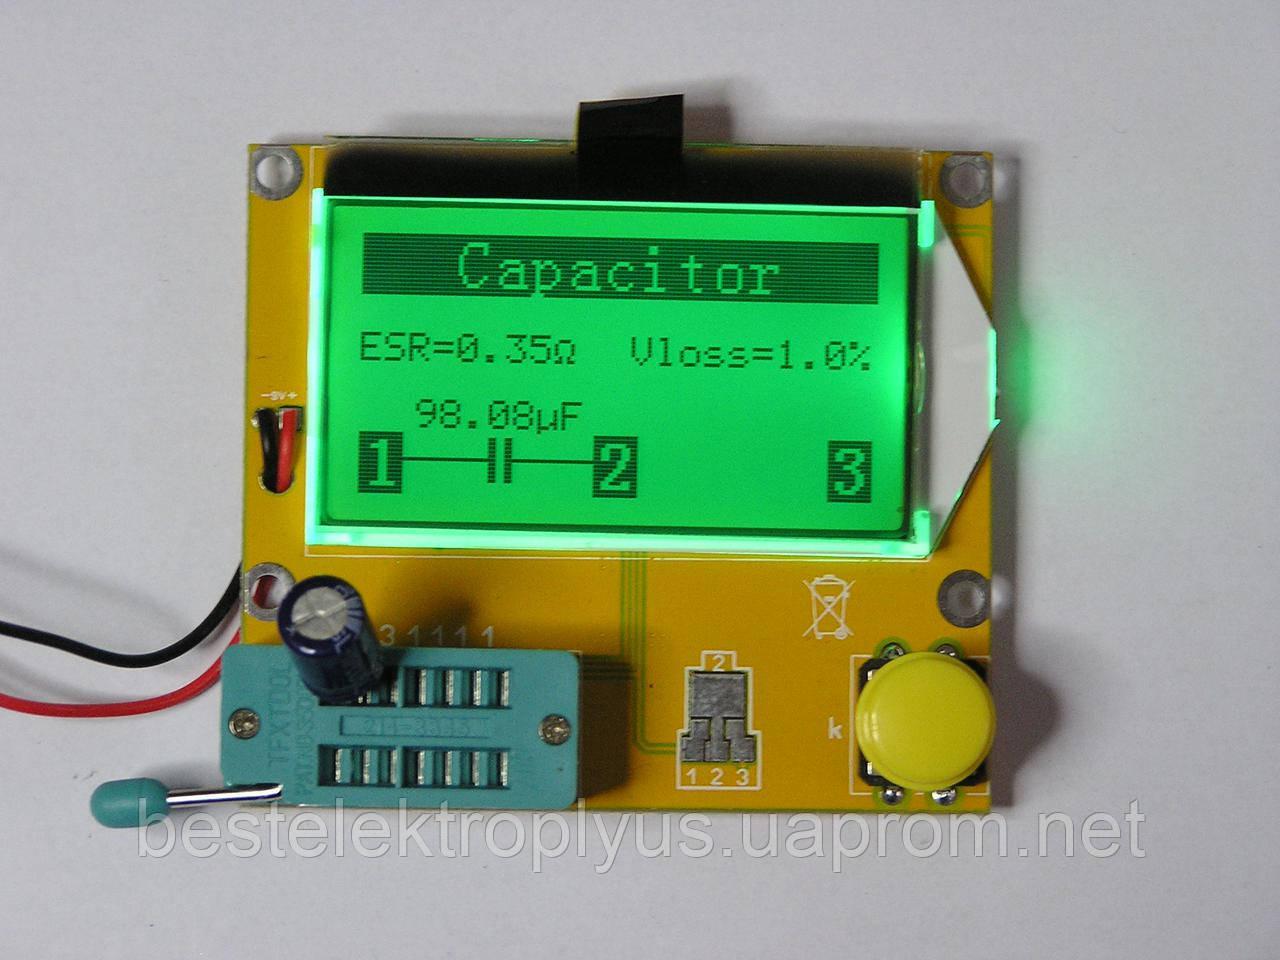 Тестер LCR, RLC, ESR-метр, тестер диодов, транзисторов